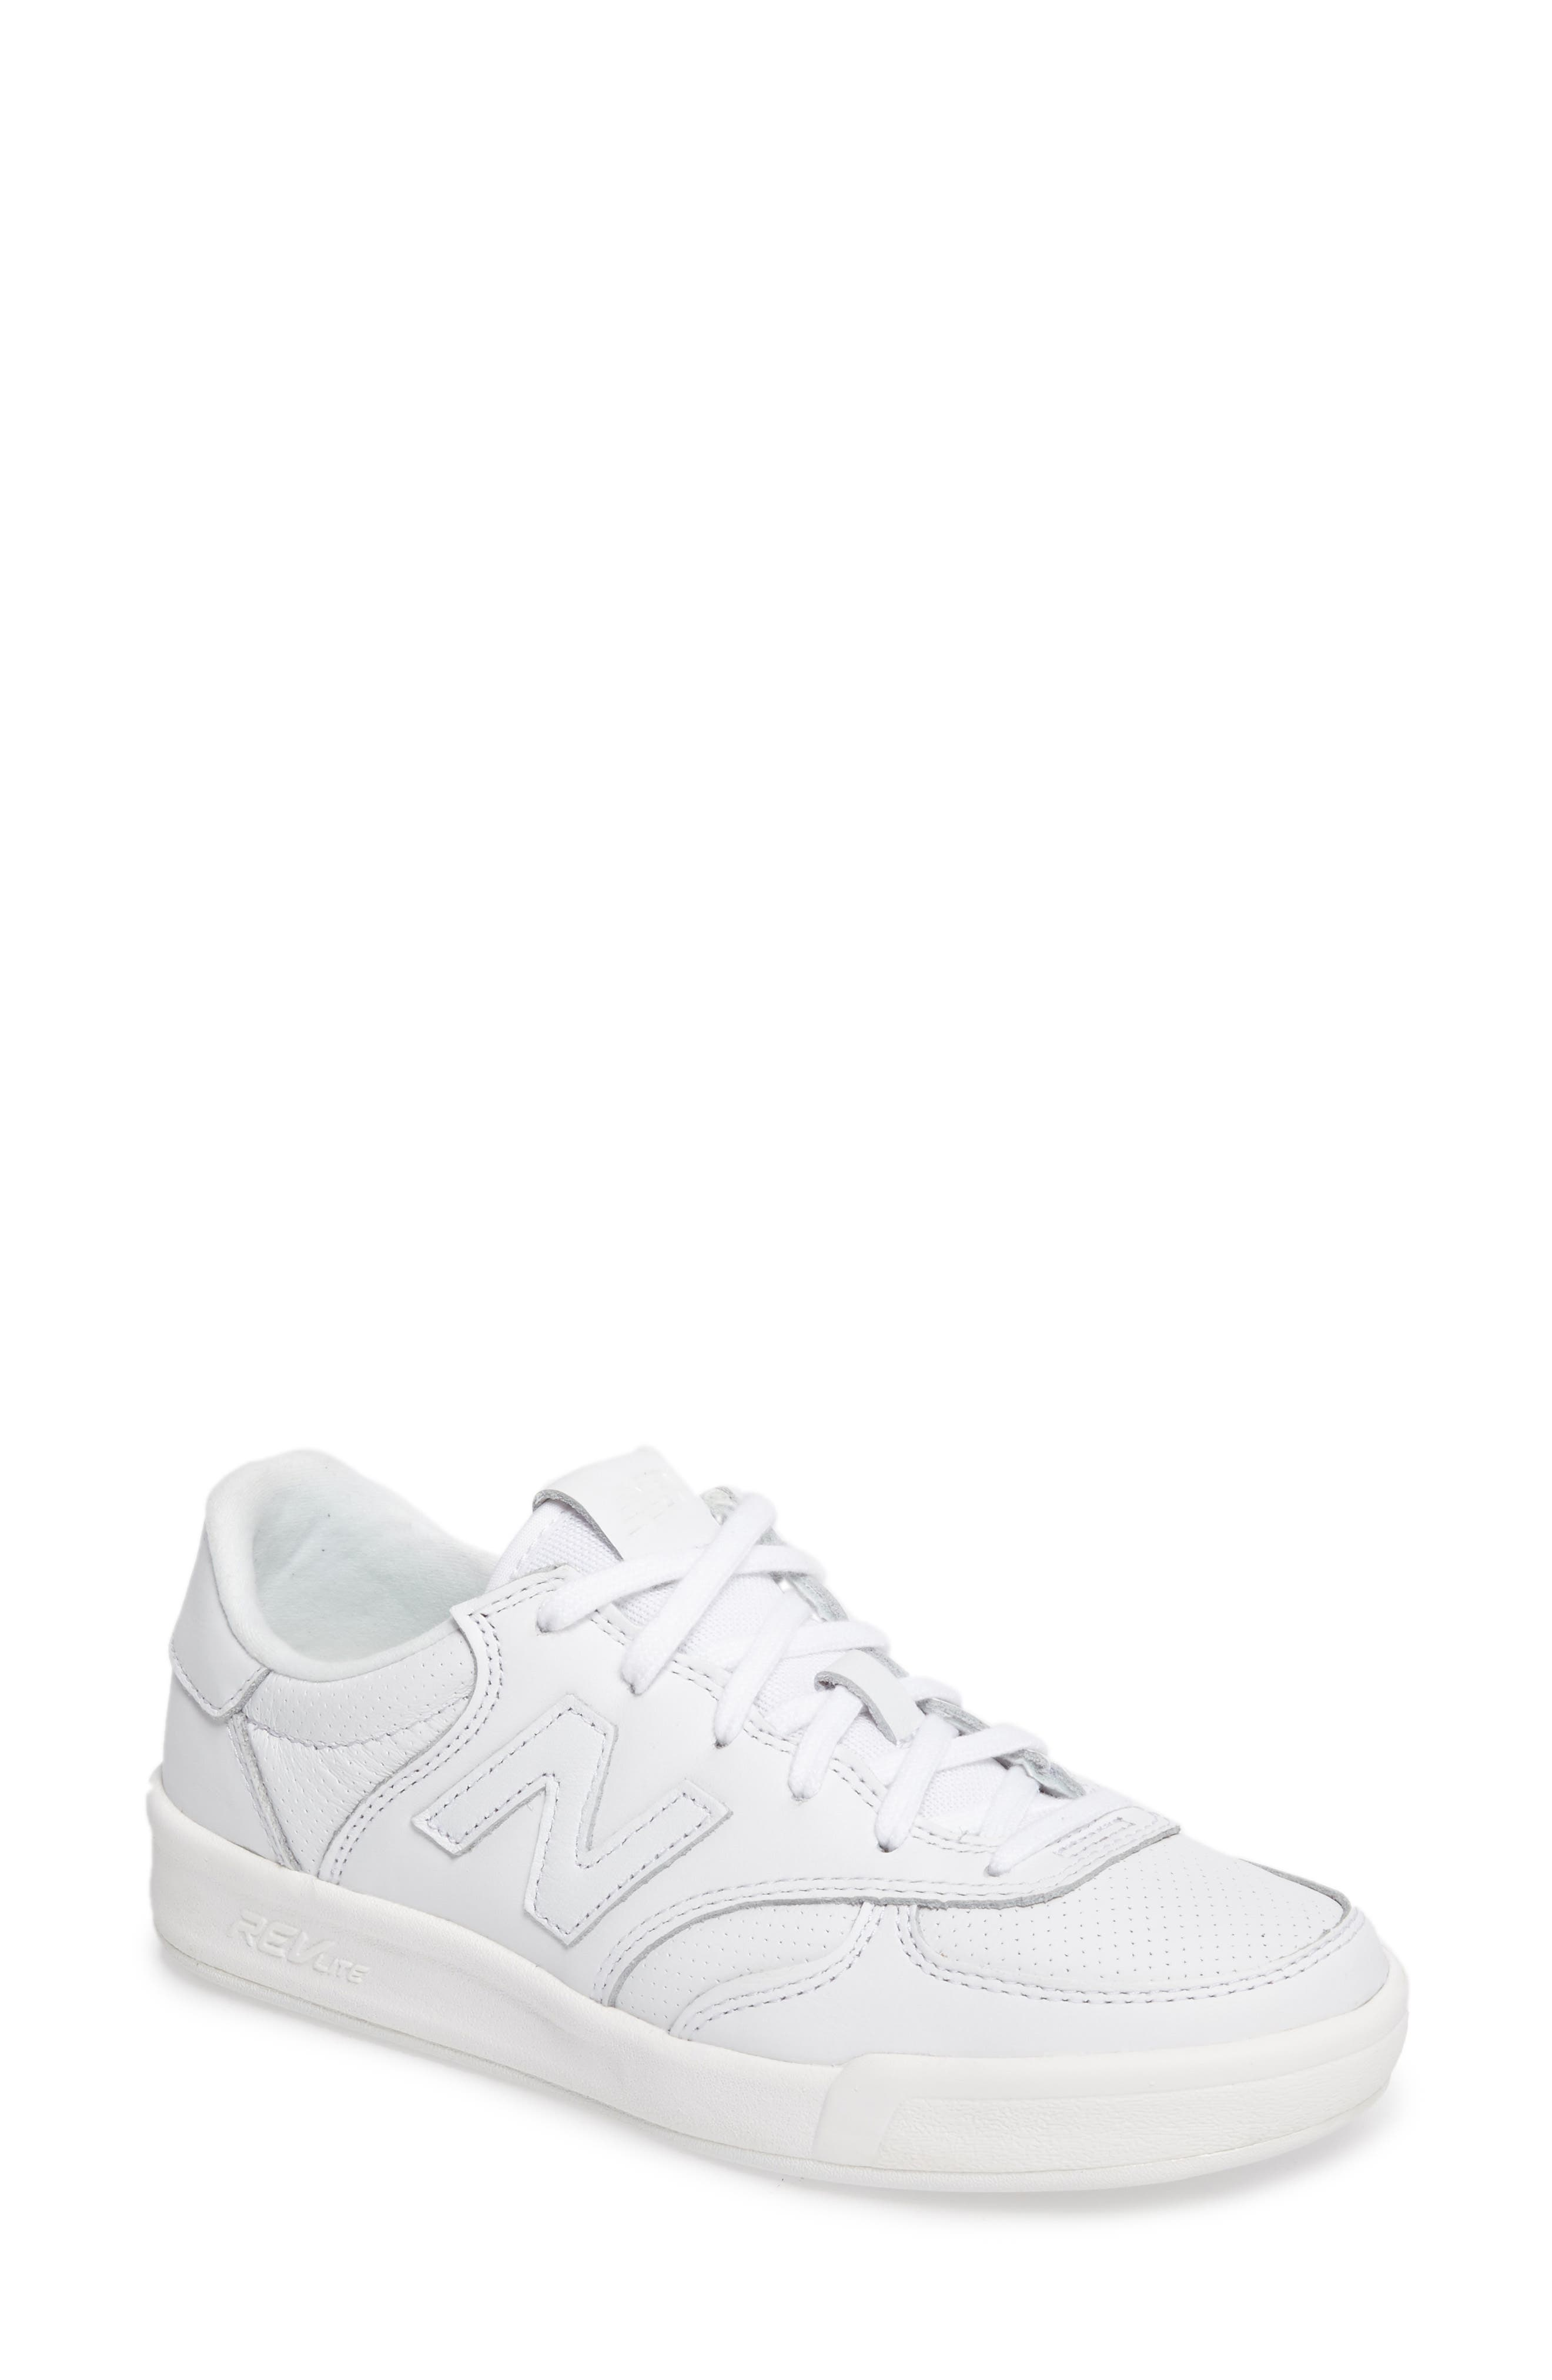 New Balance 300 Sneaker (Women)